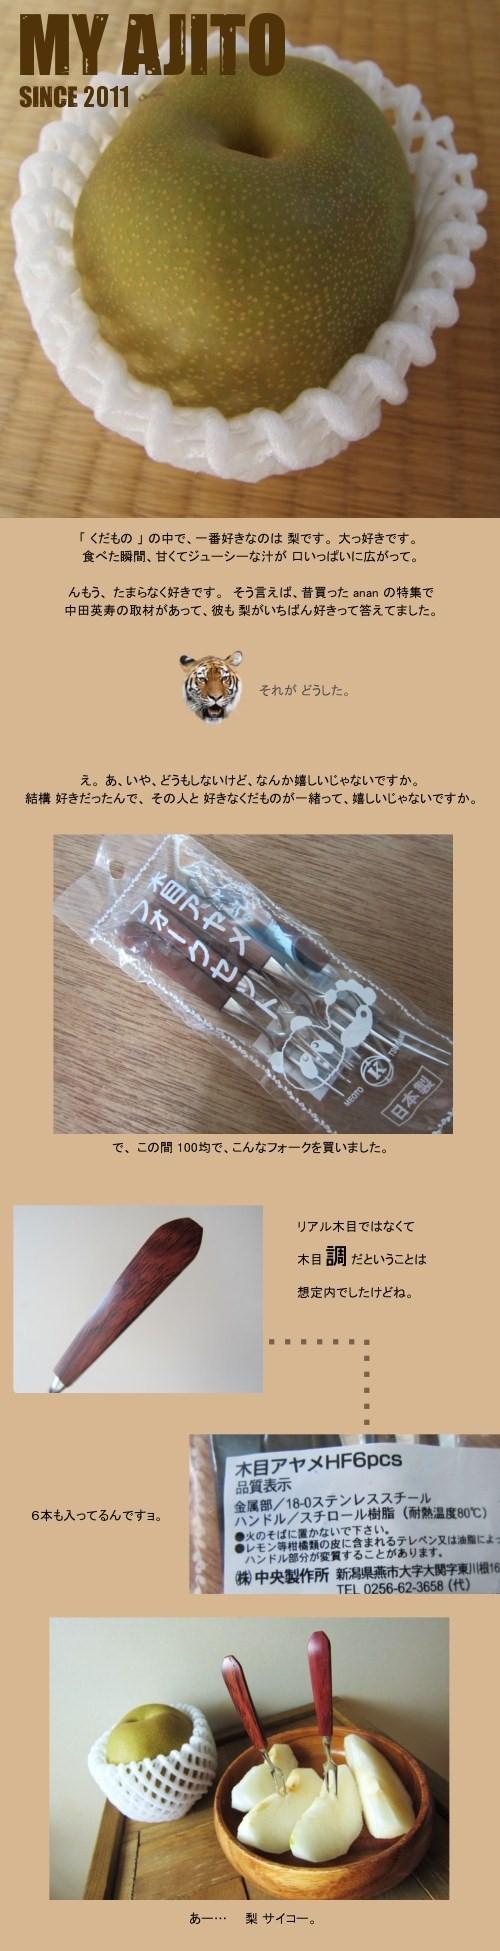 n_ama_01.jpg